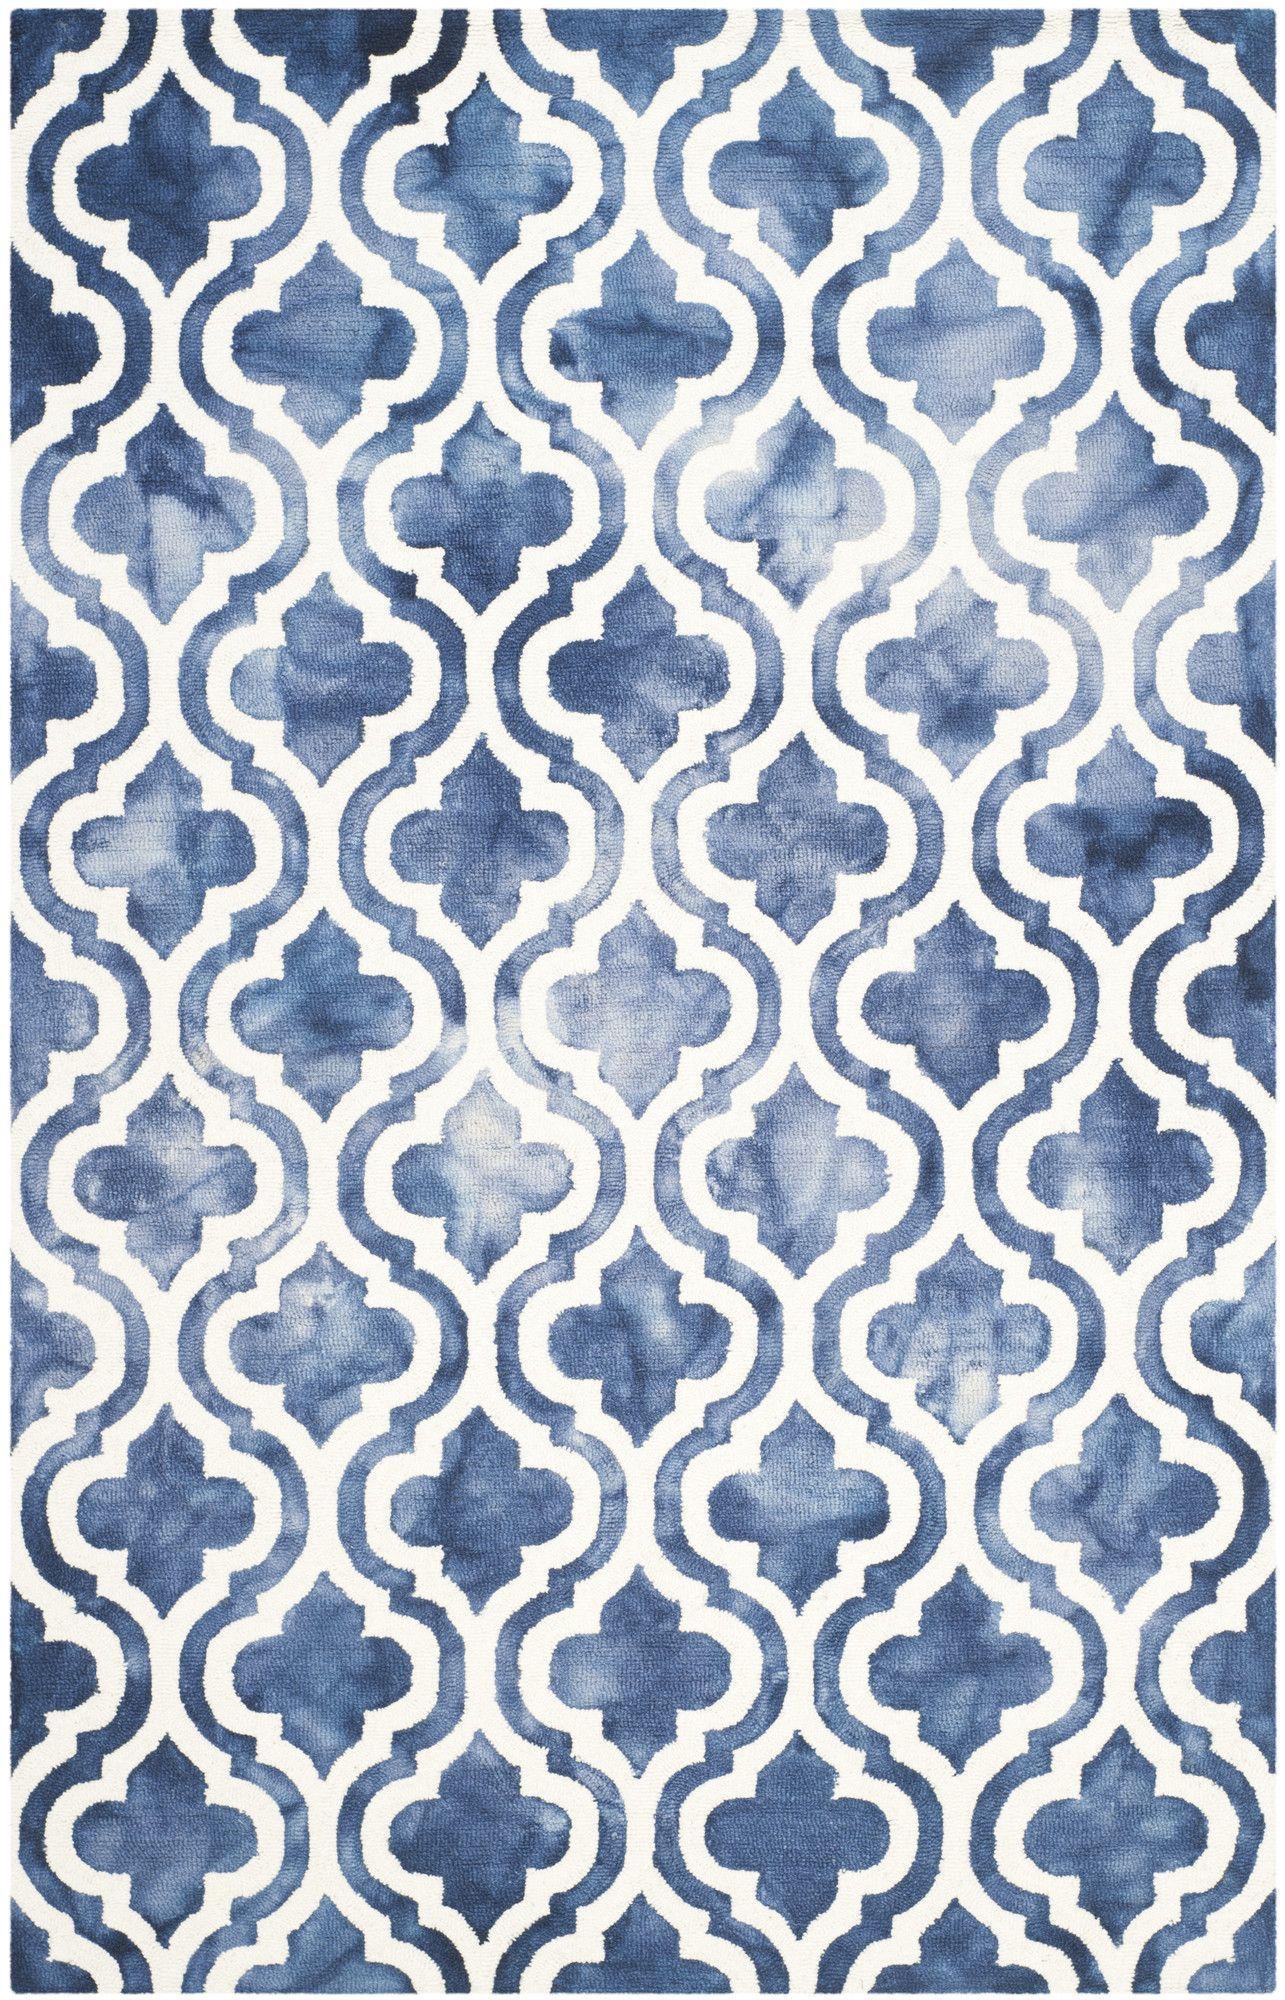 Elizabeth Hand-Tufted Dip Dye Navy/Ivory Area Rug